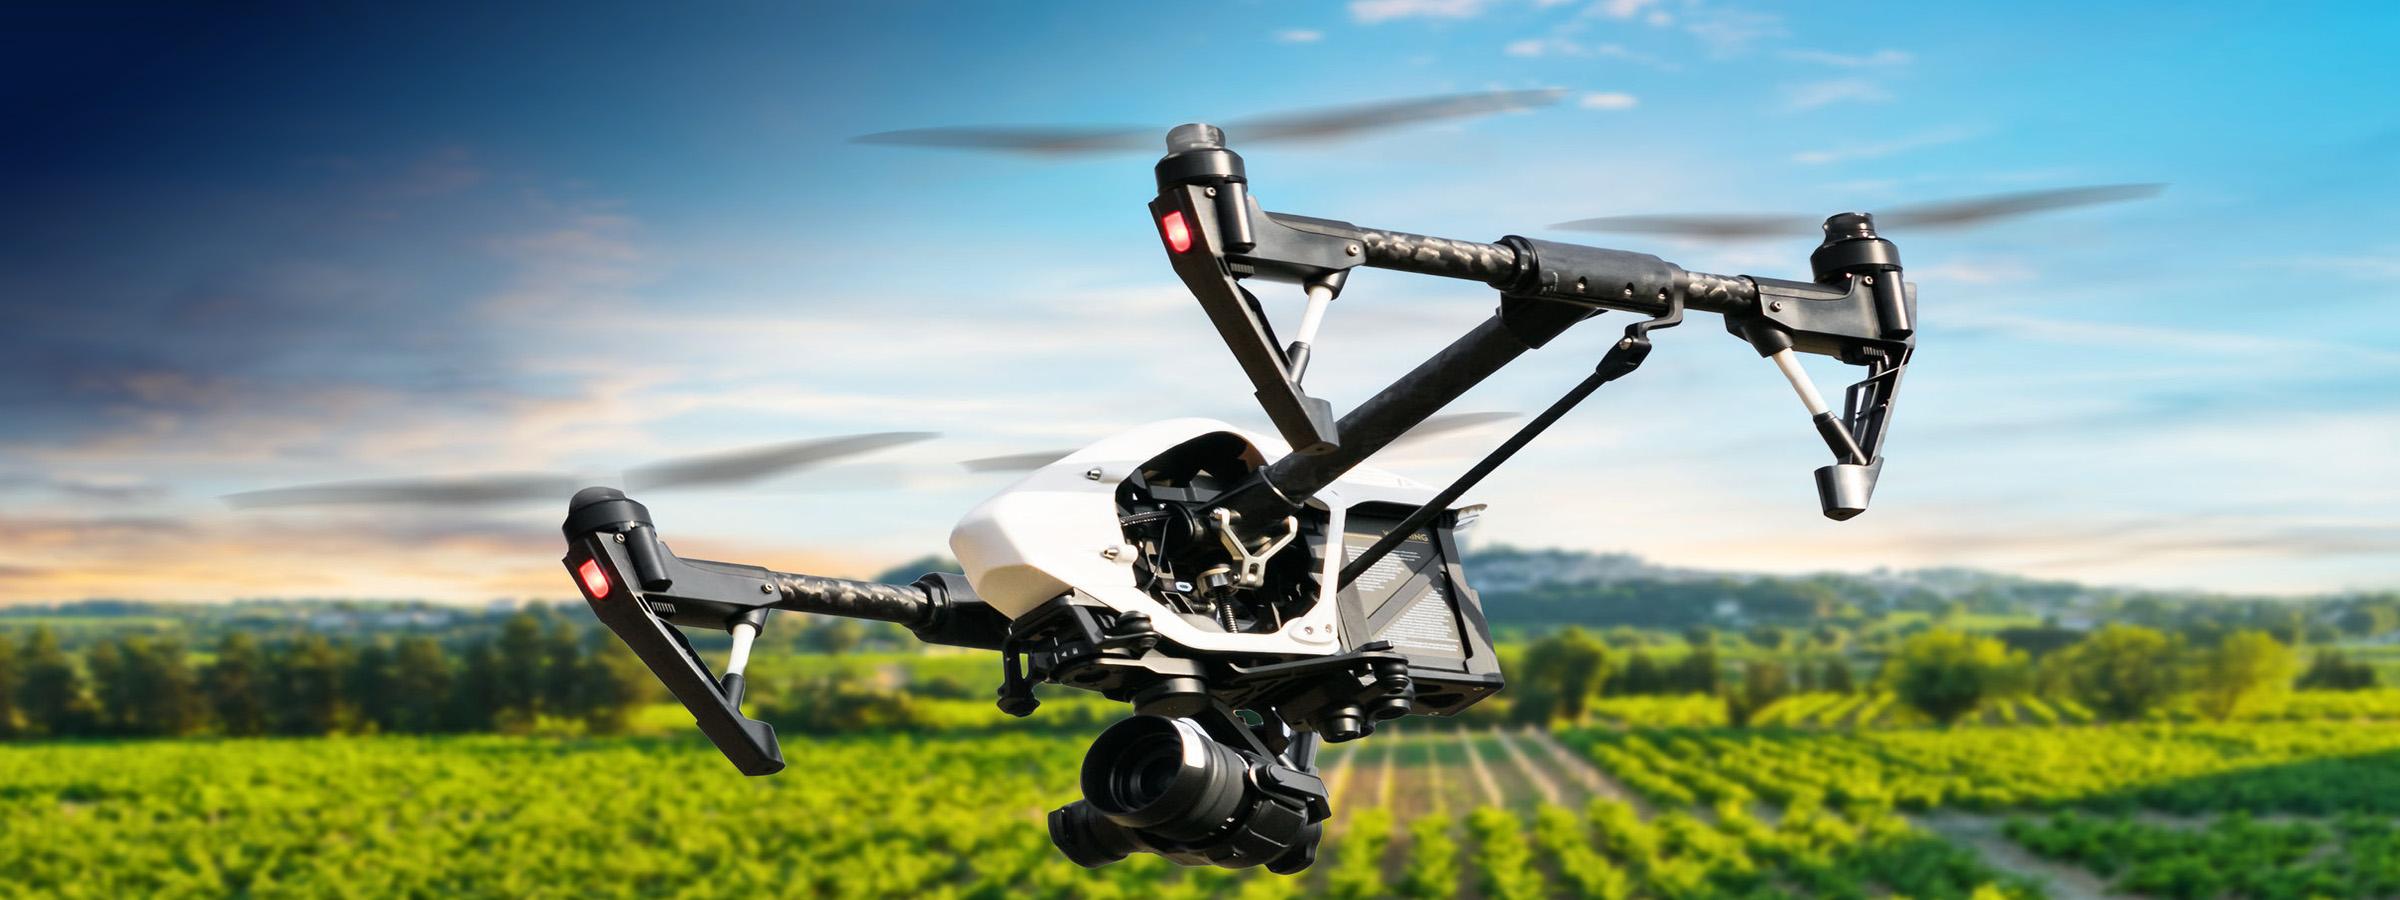 Droni e agricoluta